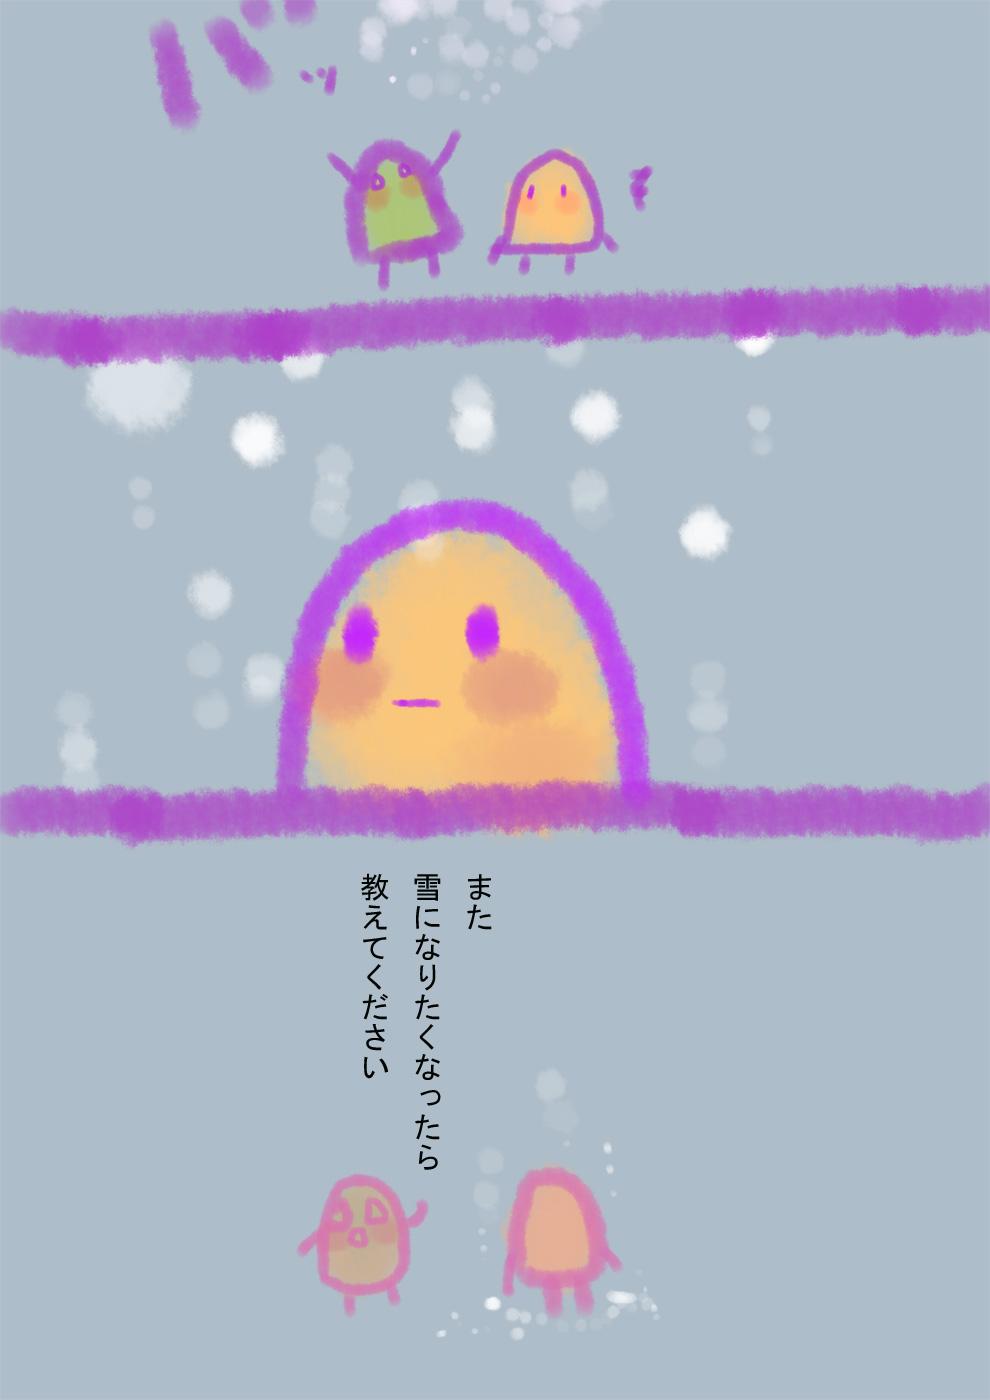 http://ahito.com/comic/short/nega/img/2018/20180312_2/02.jpg